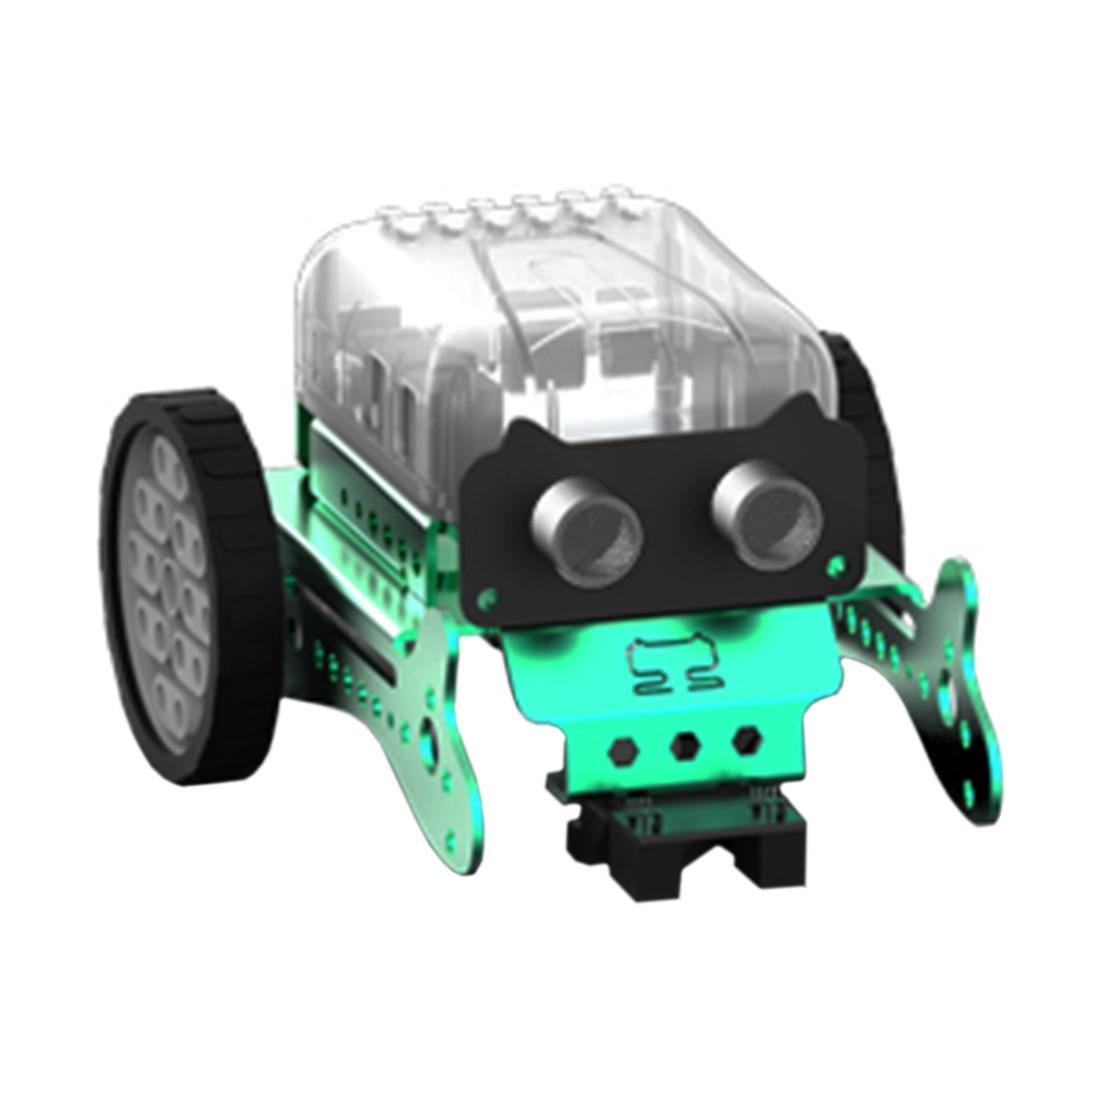 MODIKIER Children DIY High Tech Neo Programming Scratch Intelligent Obstacle Avoidance Car Robot Kit Programmable Toys Green